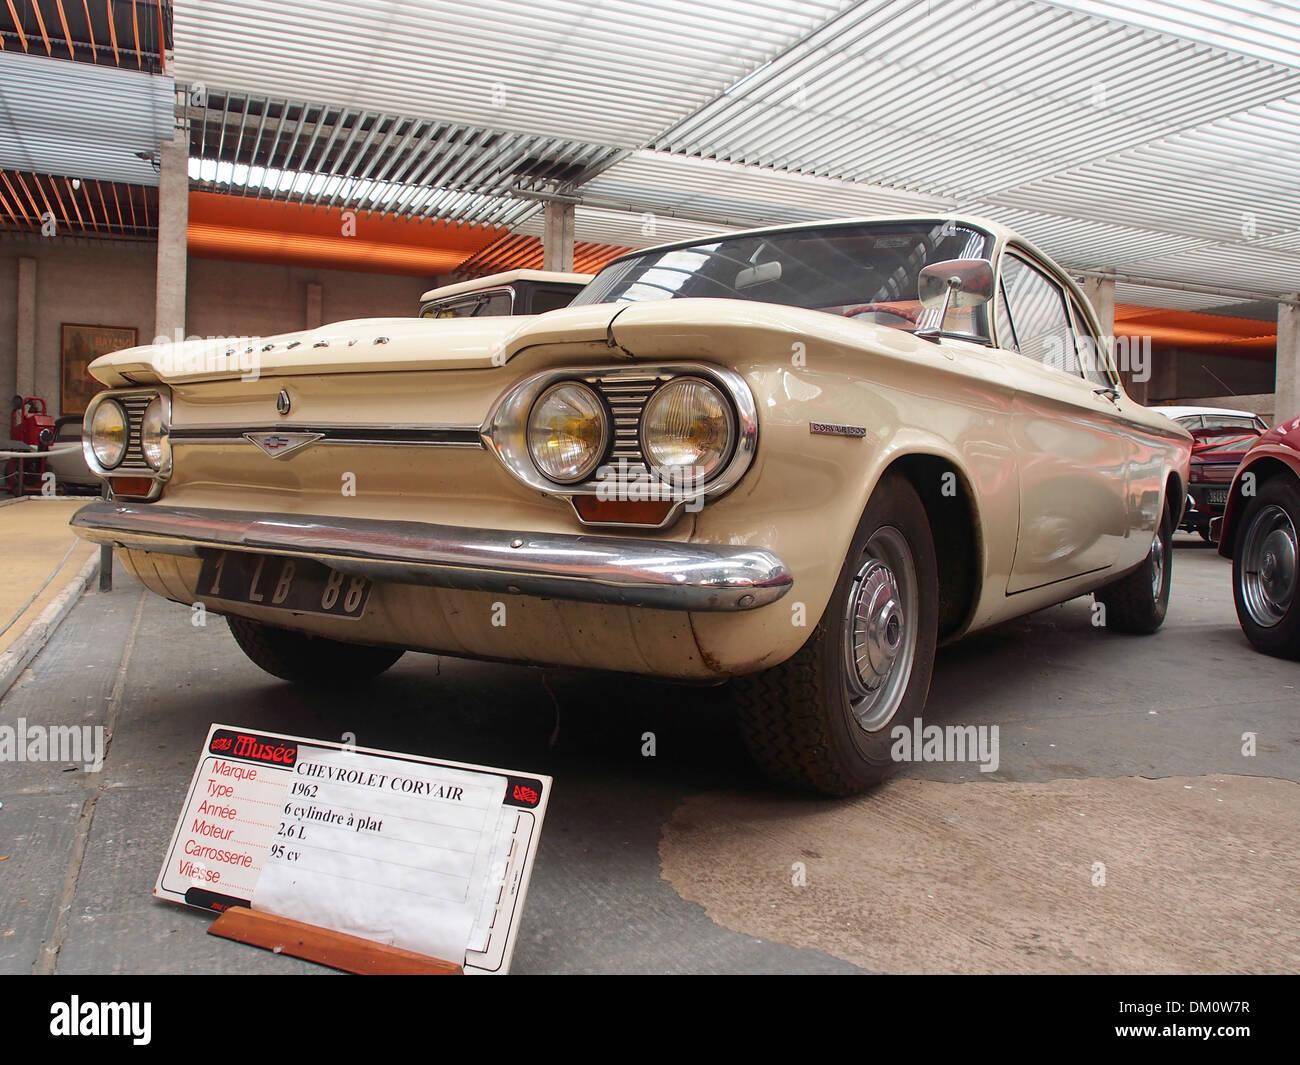 Maak een titel. 1962 Chevrolet Corvair 6cil 2,6L 95hp Immagini Stock